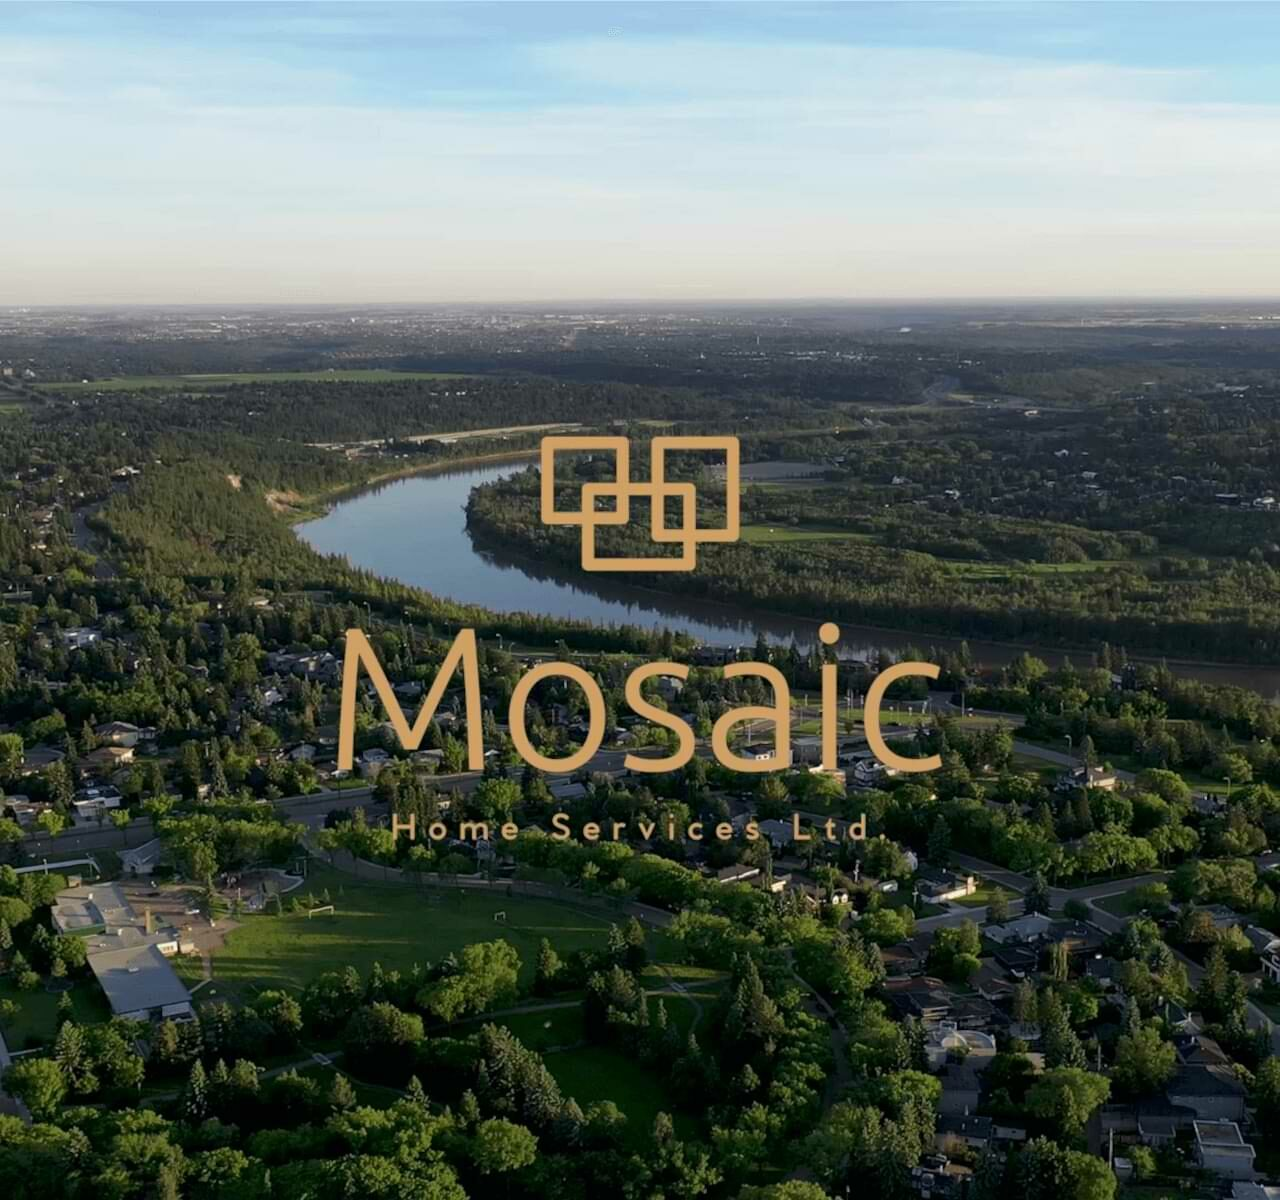 https://mk0mosaichomesep04mv.kinstacdn.com/wp-content/uploads/2021/04/Mosaic-Home-Services-Large-Enough-To-Serve-You-Thumbnail-1-1280x1200.jpg